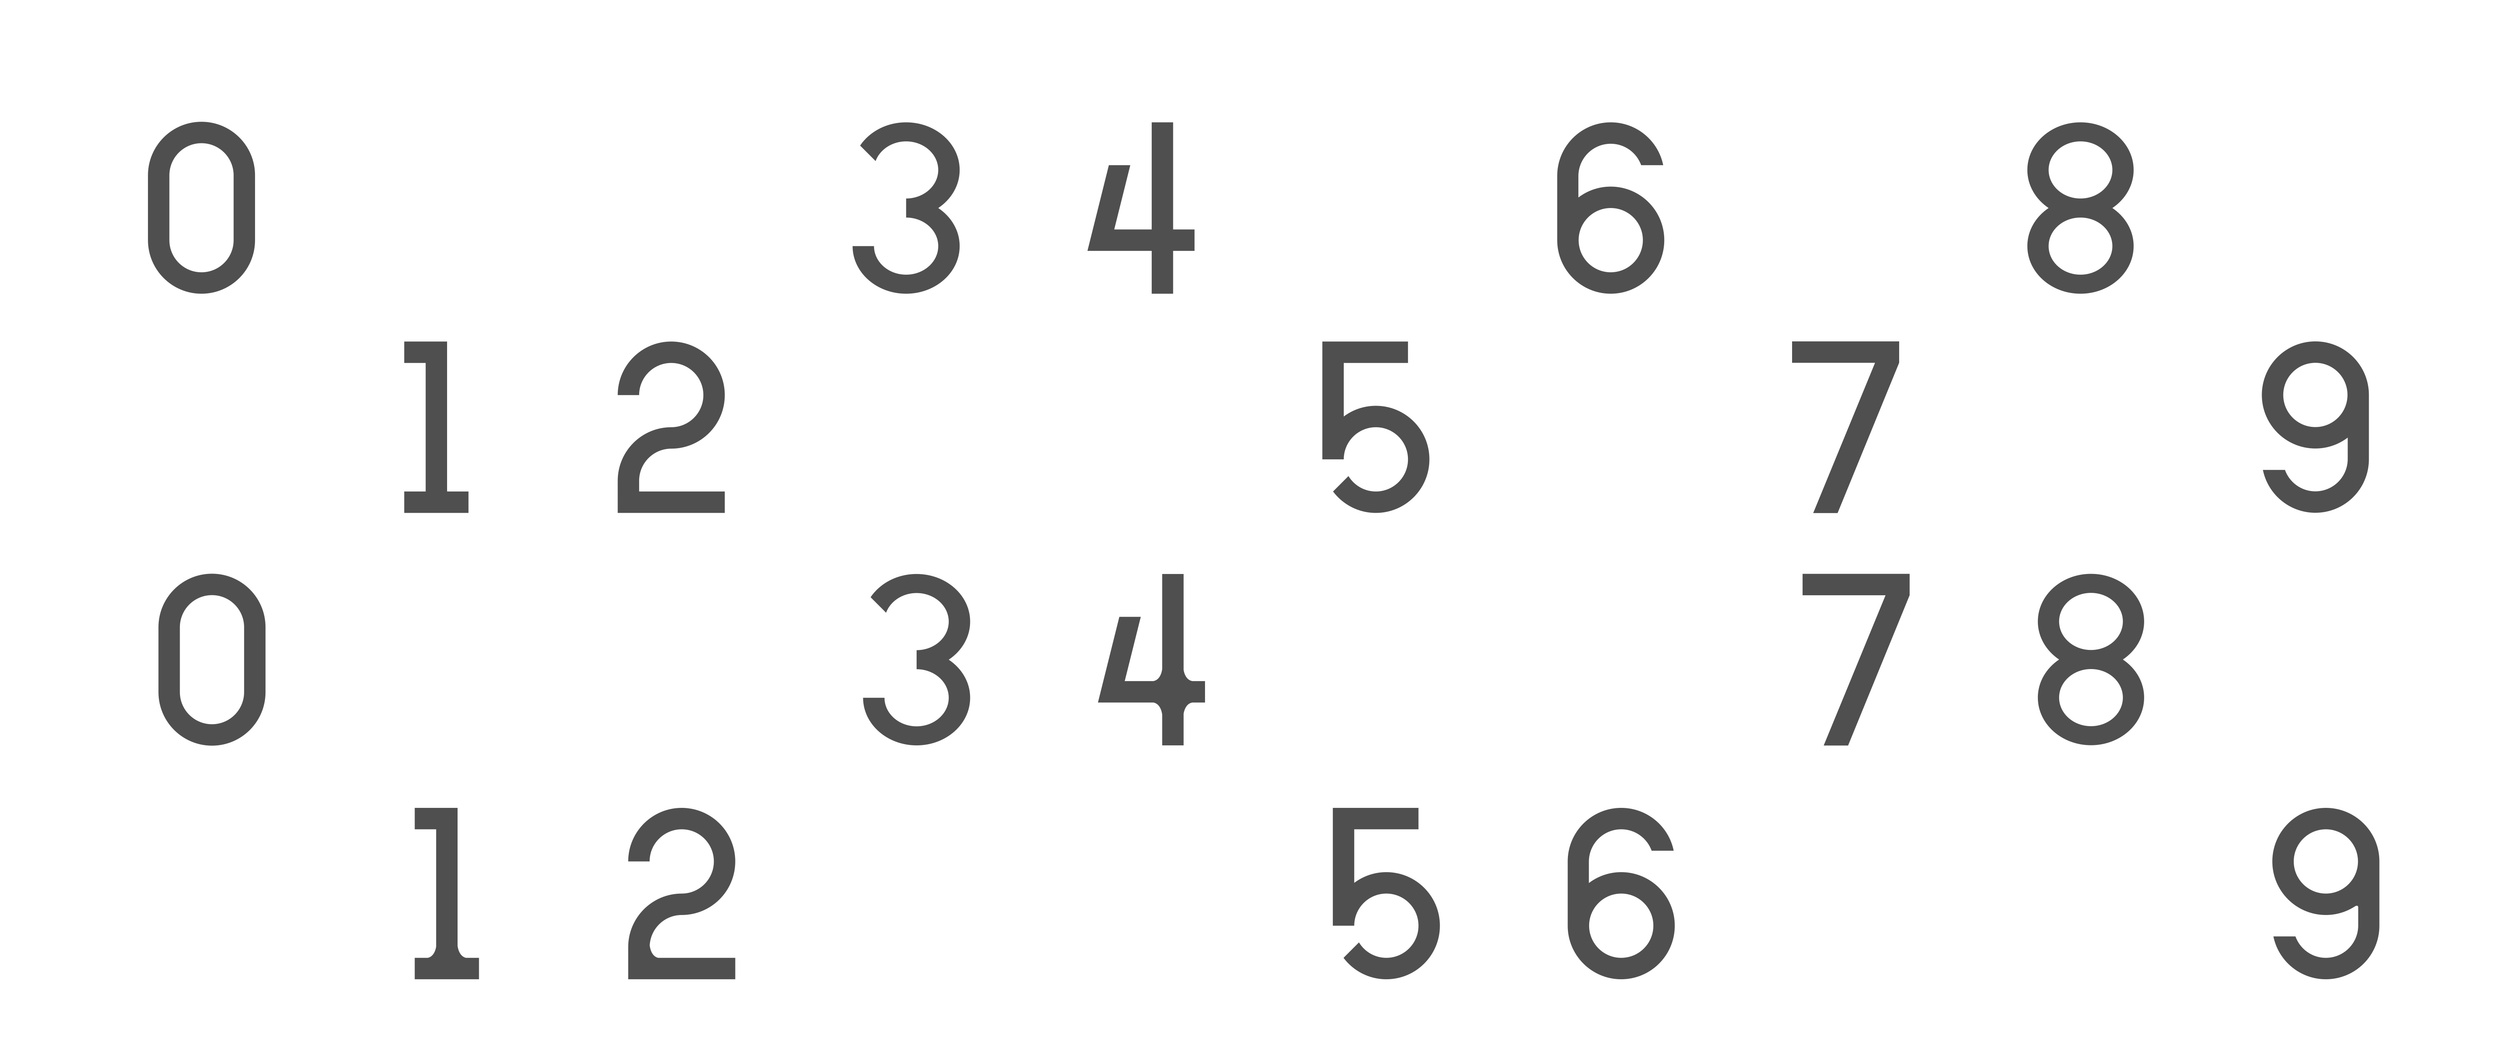 numbersss.jpg